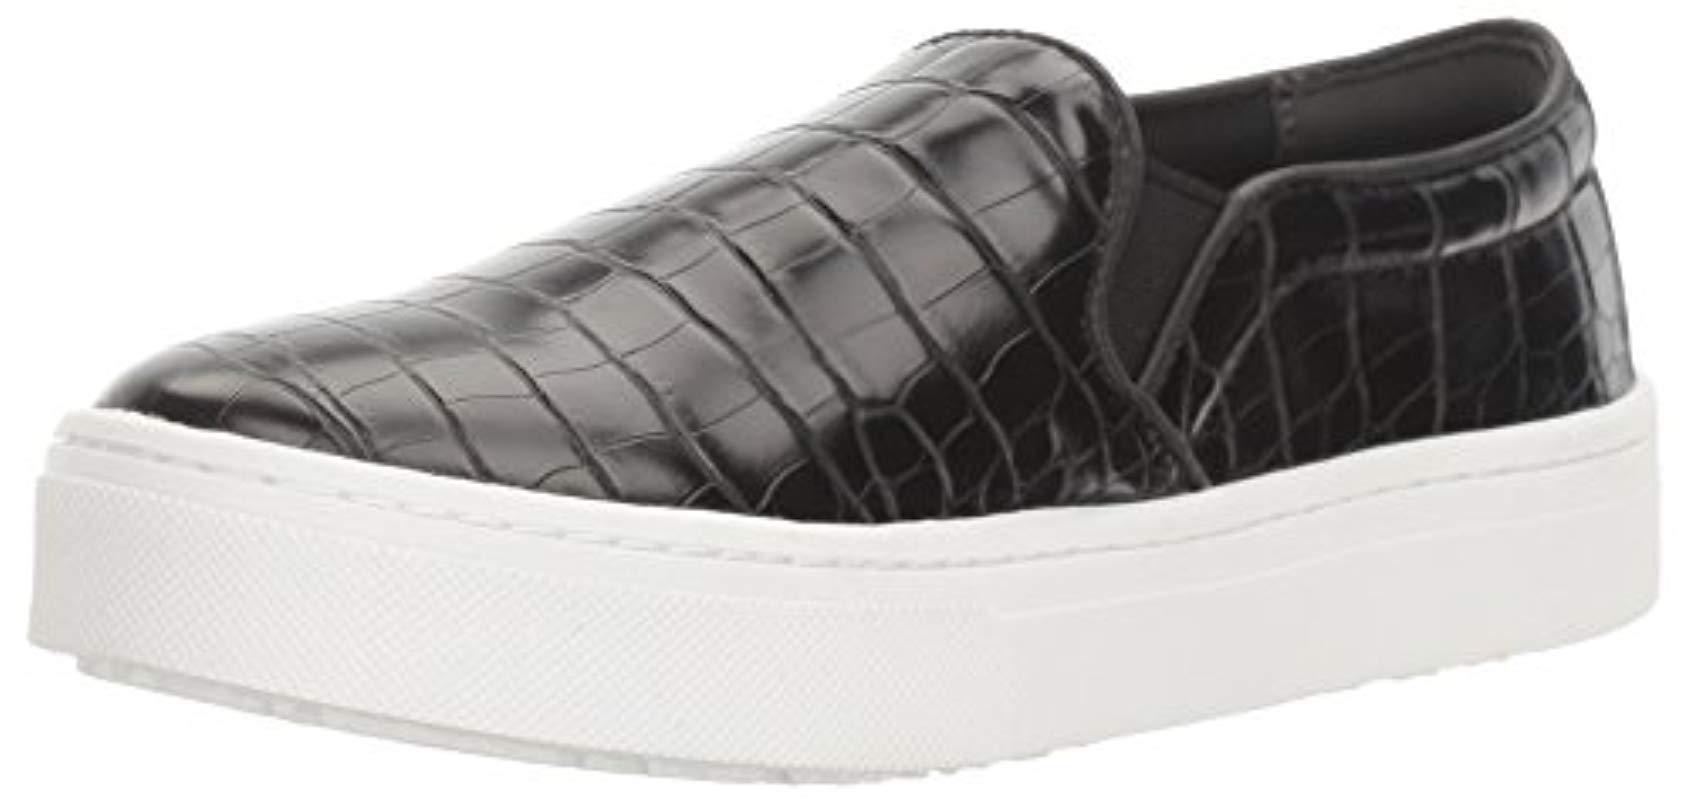 Lyst Sam Edelman Fashion Lacey Fashion Edelman Sneaker in schwarz cb7934